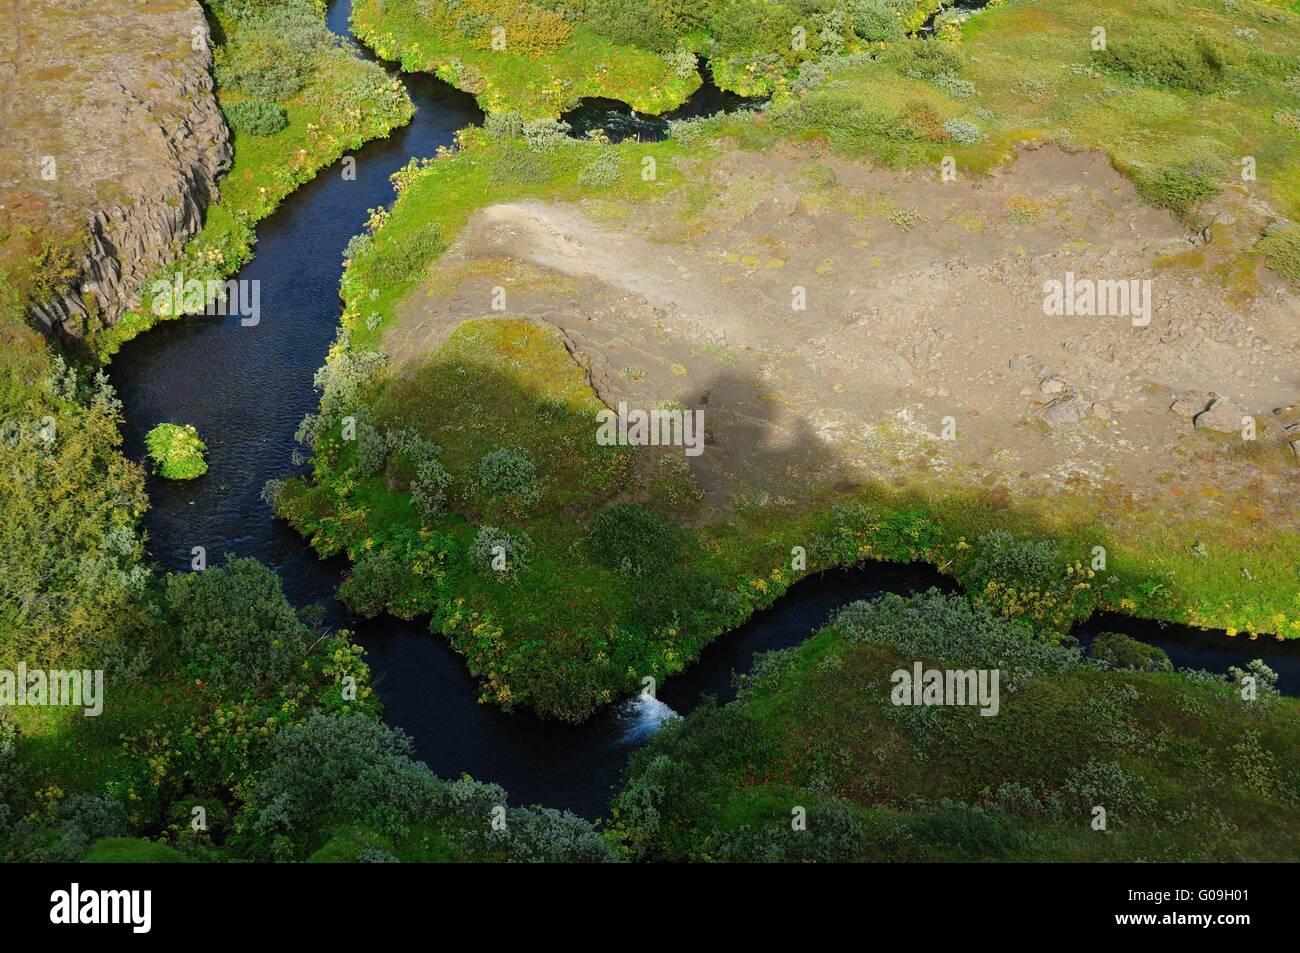 River landscape near Dettifoss, Iceland - Stock Image